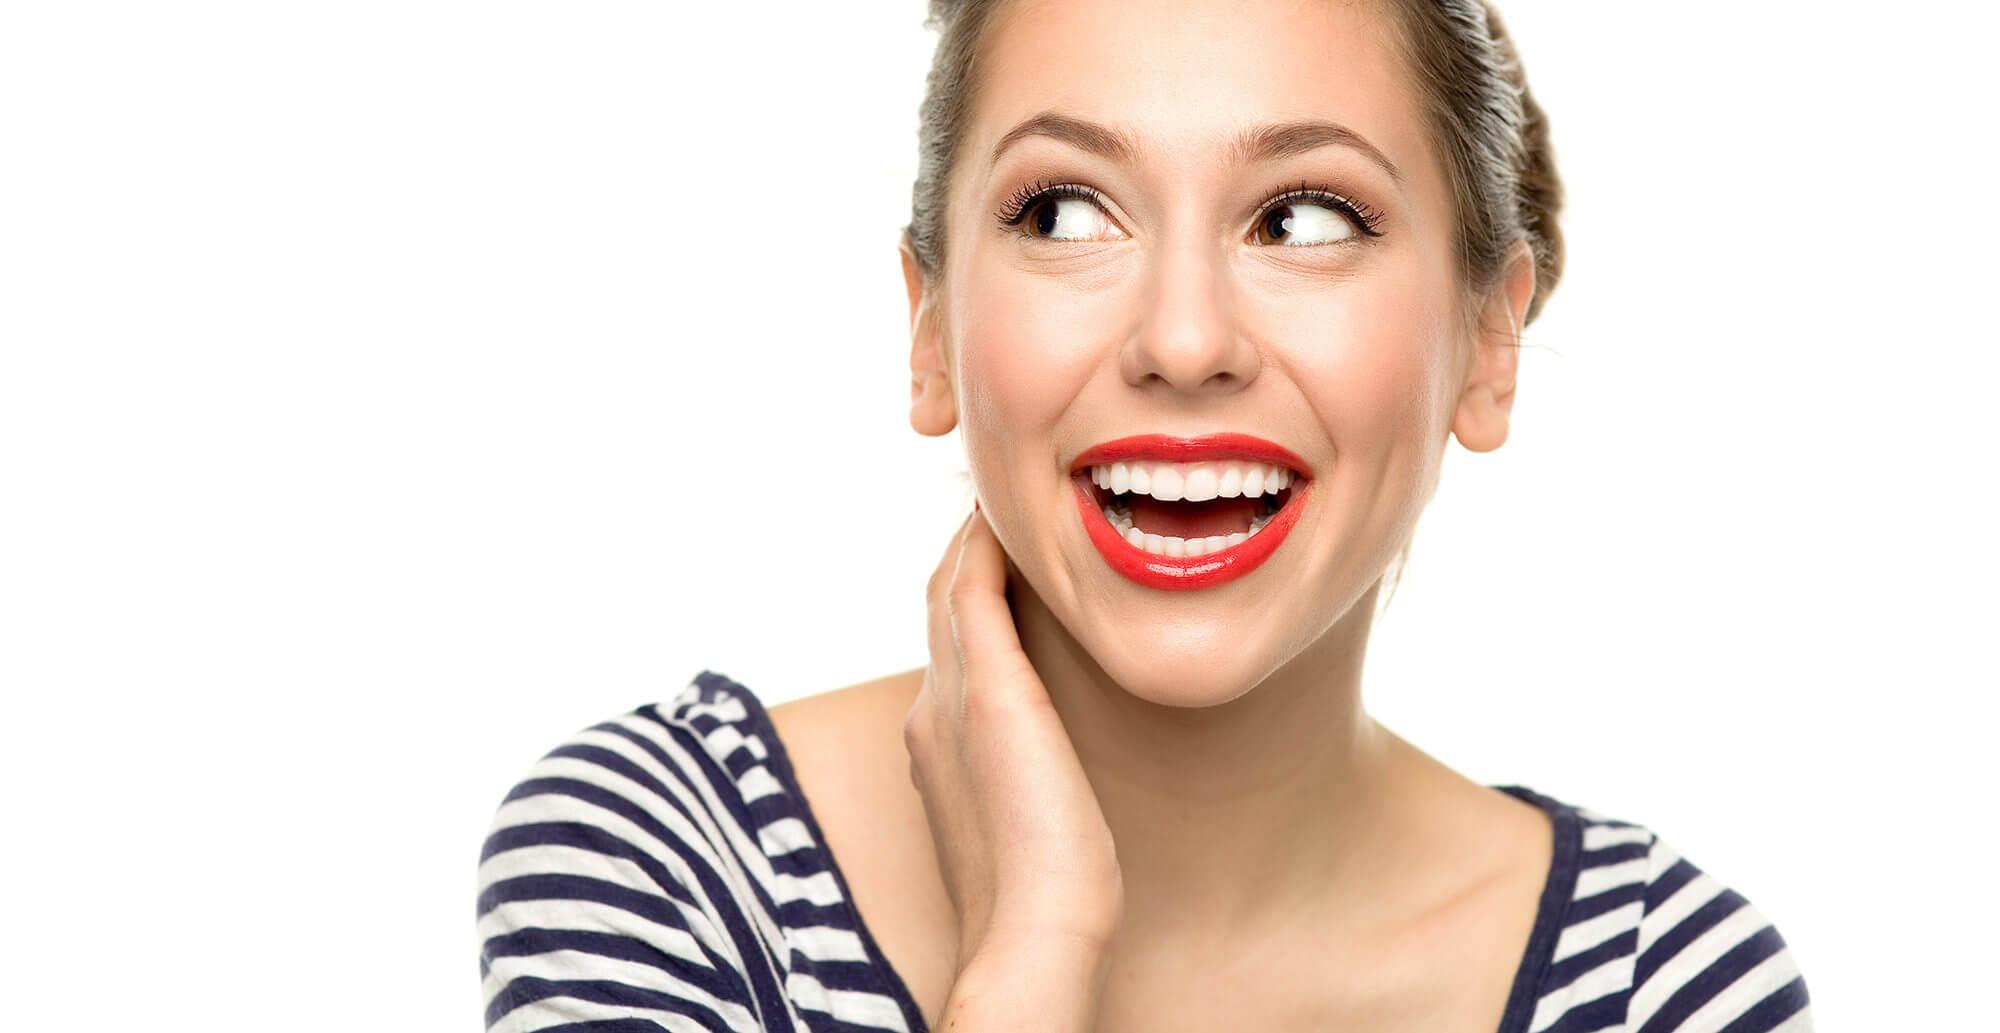 odontologo en lima